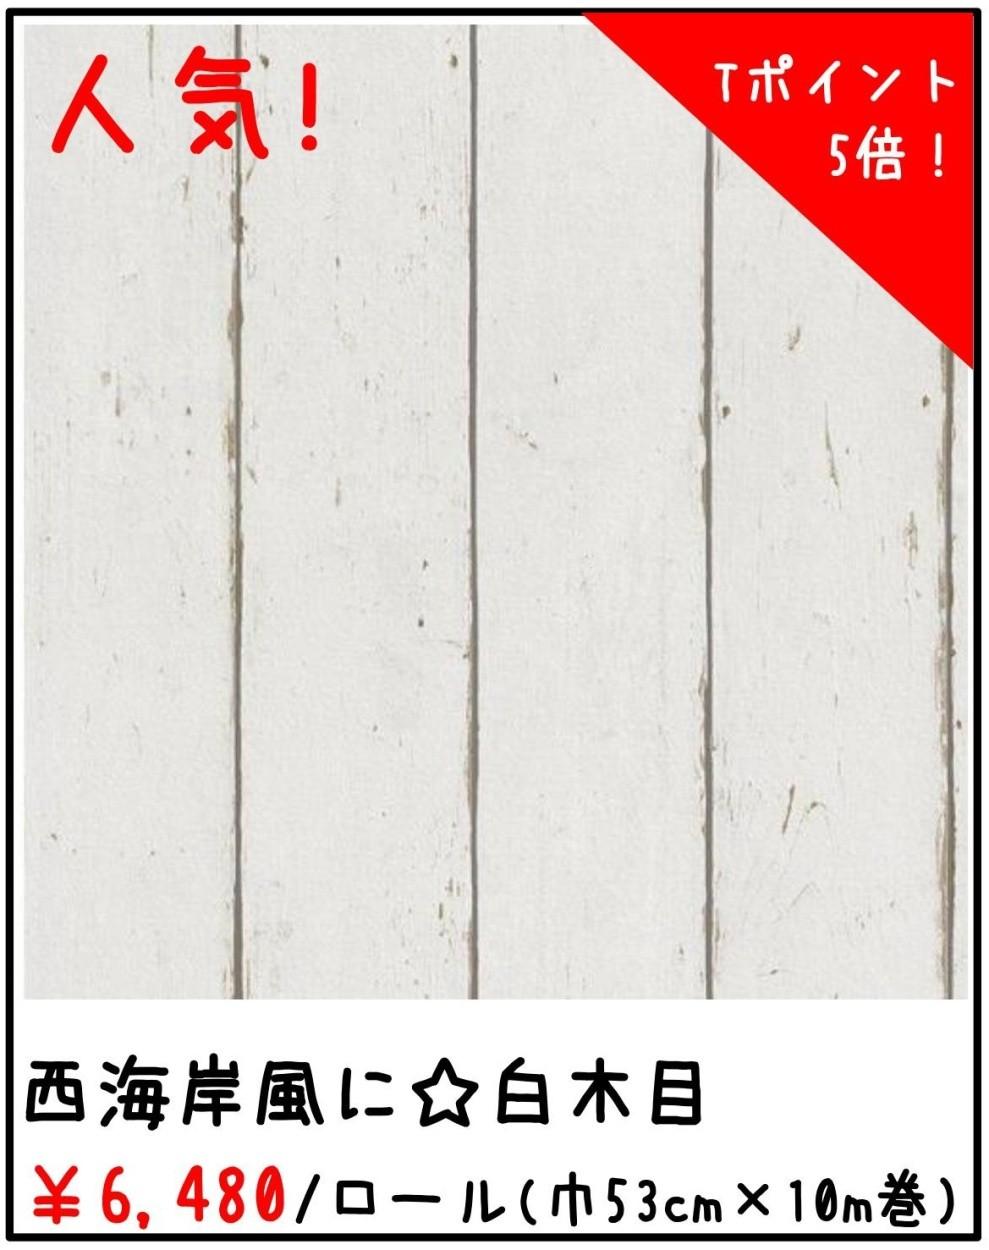 rasch白木目 479638 西海岸風インテリアにオススメの古材風(廃材風)